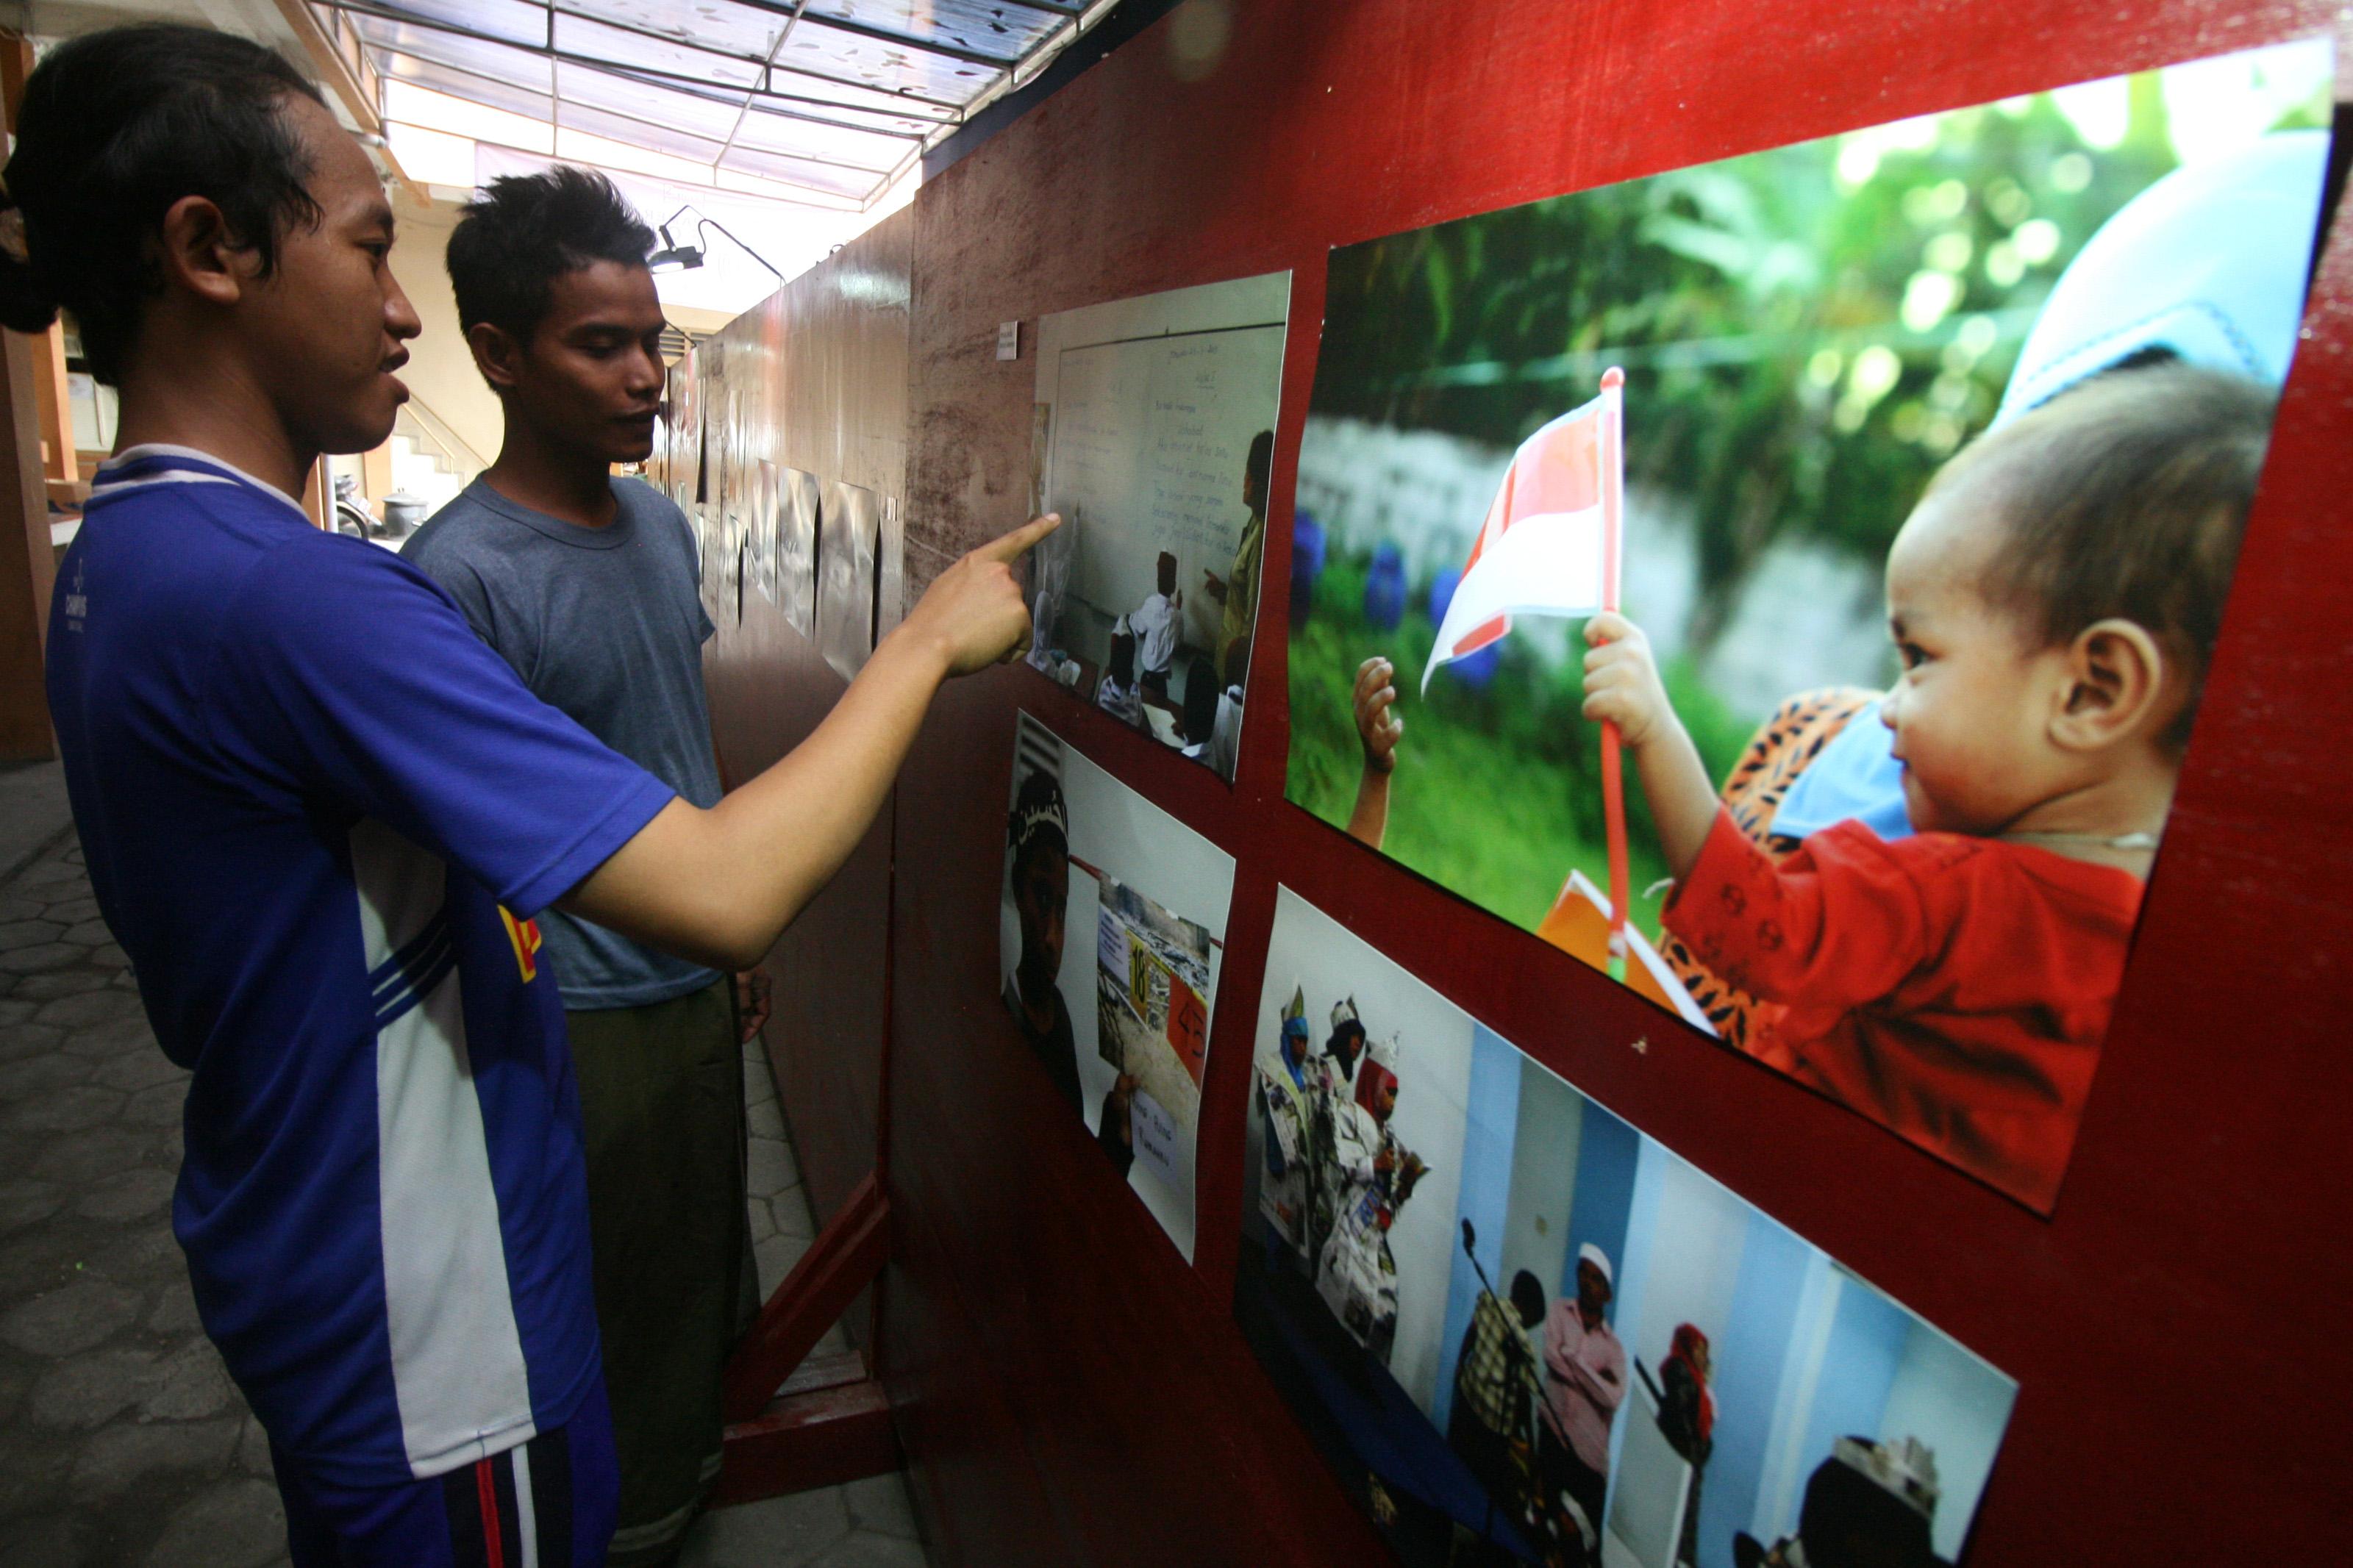 "Pengunjung mengamati pameran foto bertajuk ""Toleransi dan Keberagamaan"" di kampus Institut Agama Islam Tribakti, Kota Kediri, Jawa Timur, Jumat (30/12). Pameran yang diselenggarakan oleh Komisi Orang Hilang dan Korban Tidak Kekerasan (Kontras) bekerjasama dengan Rabithah Ma'ahid Islamiyah (Asosiasi pesantren Nahdlatul Ulama) tersebut guna mengkampanyekan toleransi kepada masyarakat luas agar menghormati perbedaan dan keberagamaan. ANTARA FOTO/Prasetia Fauzani/foc/16."